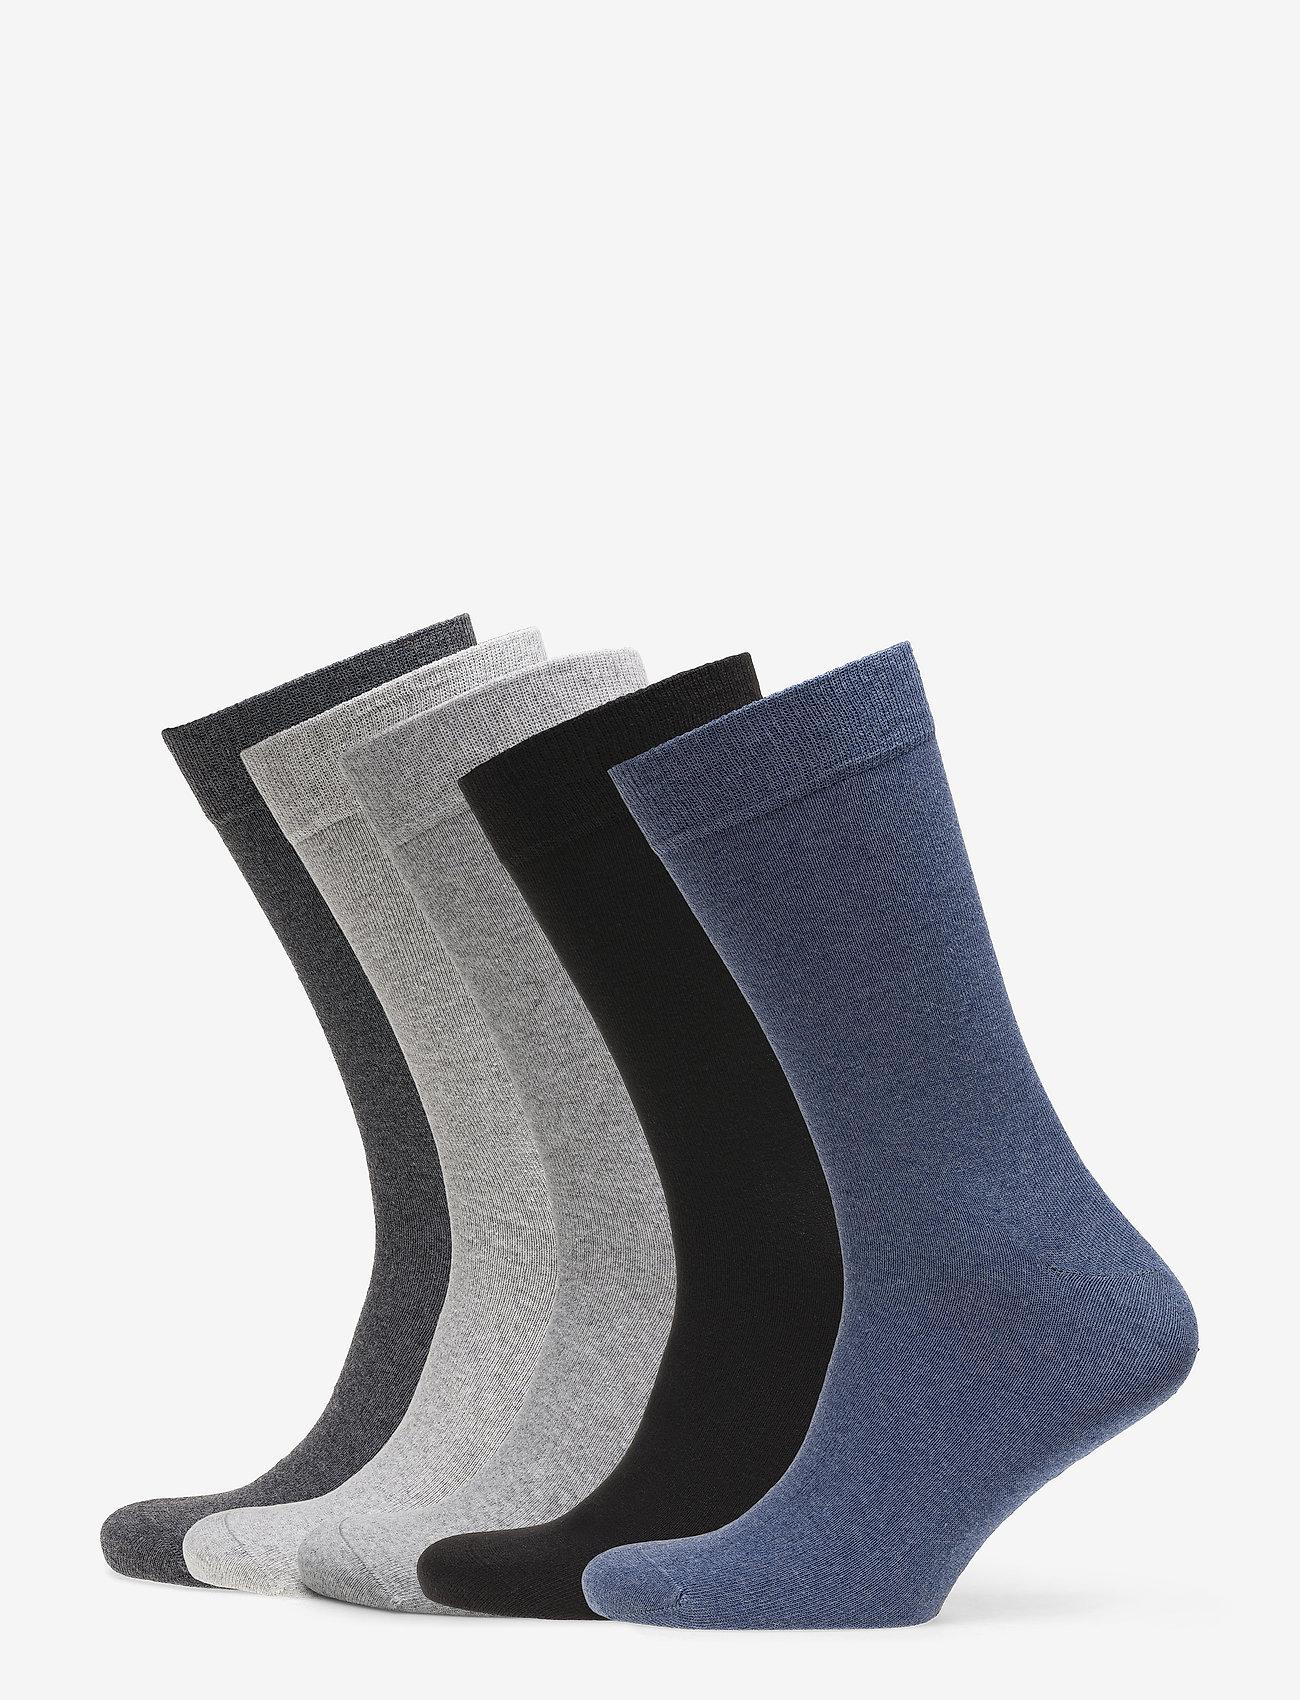 Björn Borg - 5p SOCK NOOS ESSENTIAL - regular socks - grey melange - 0